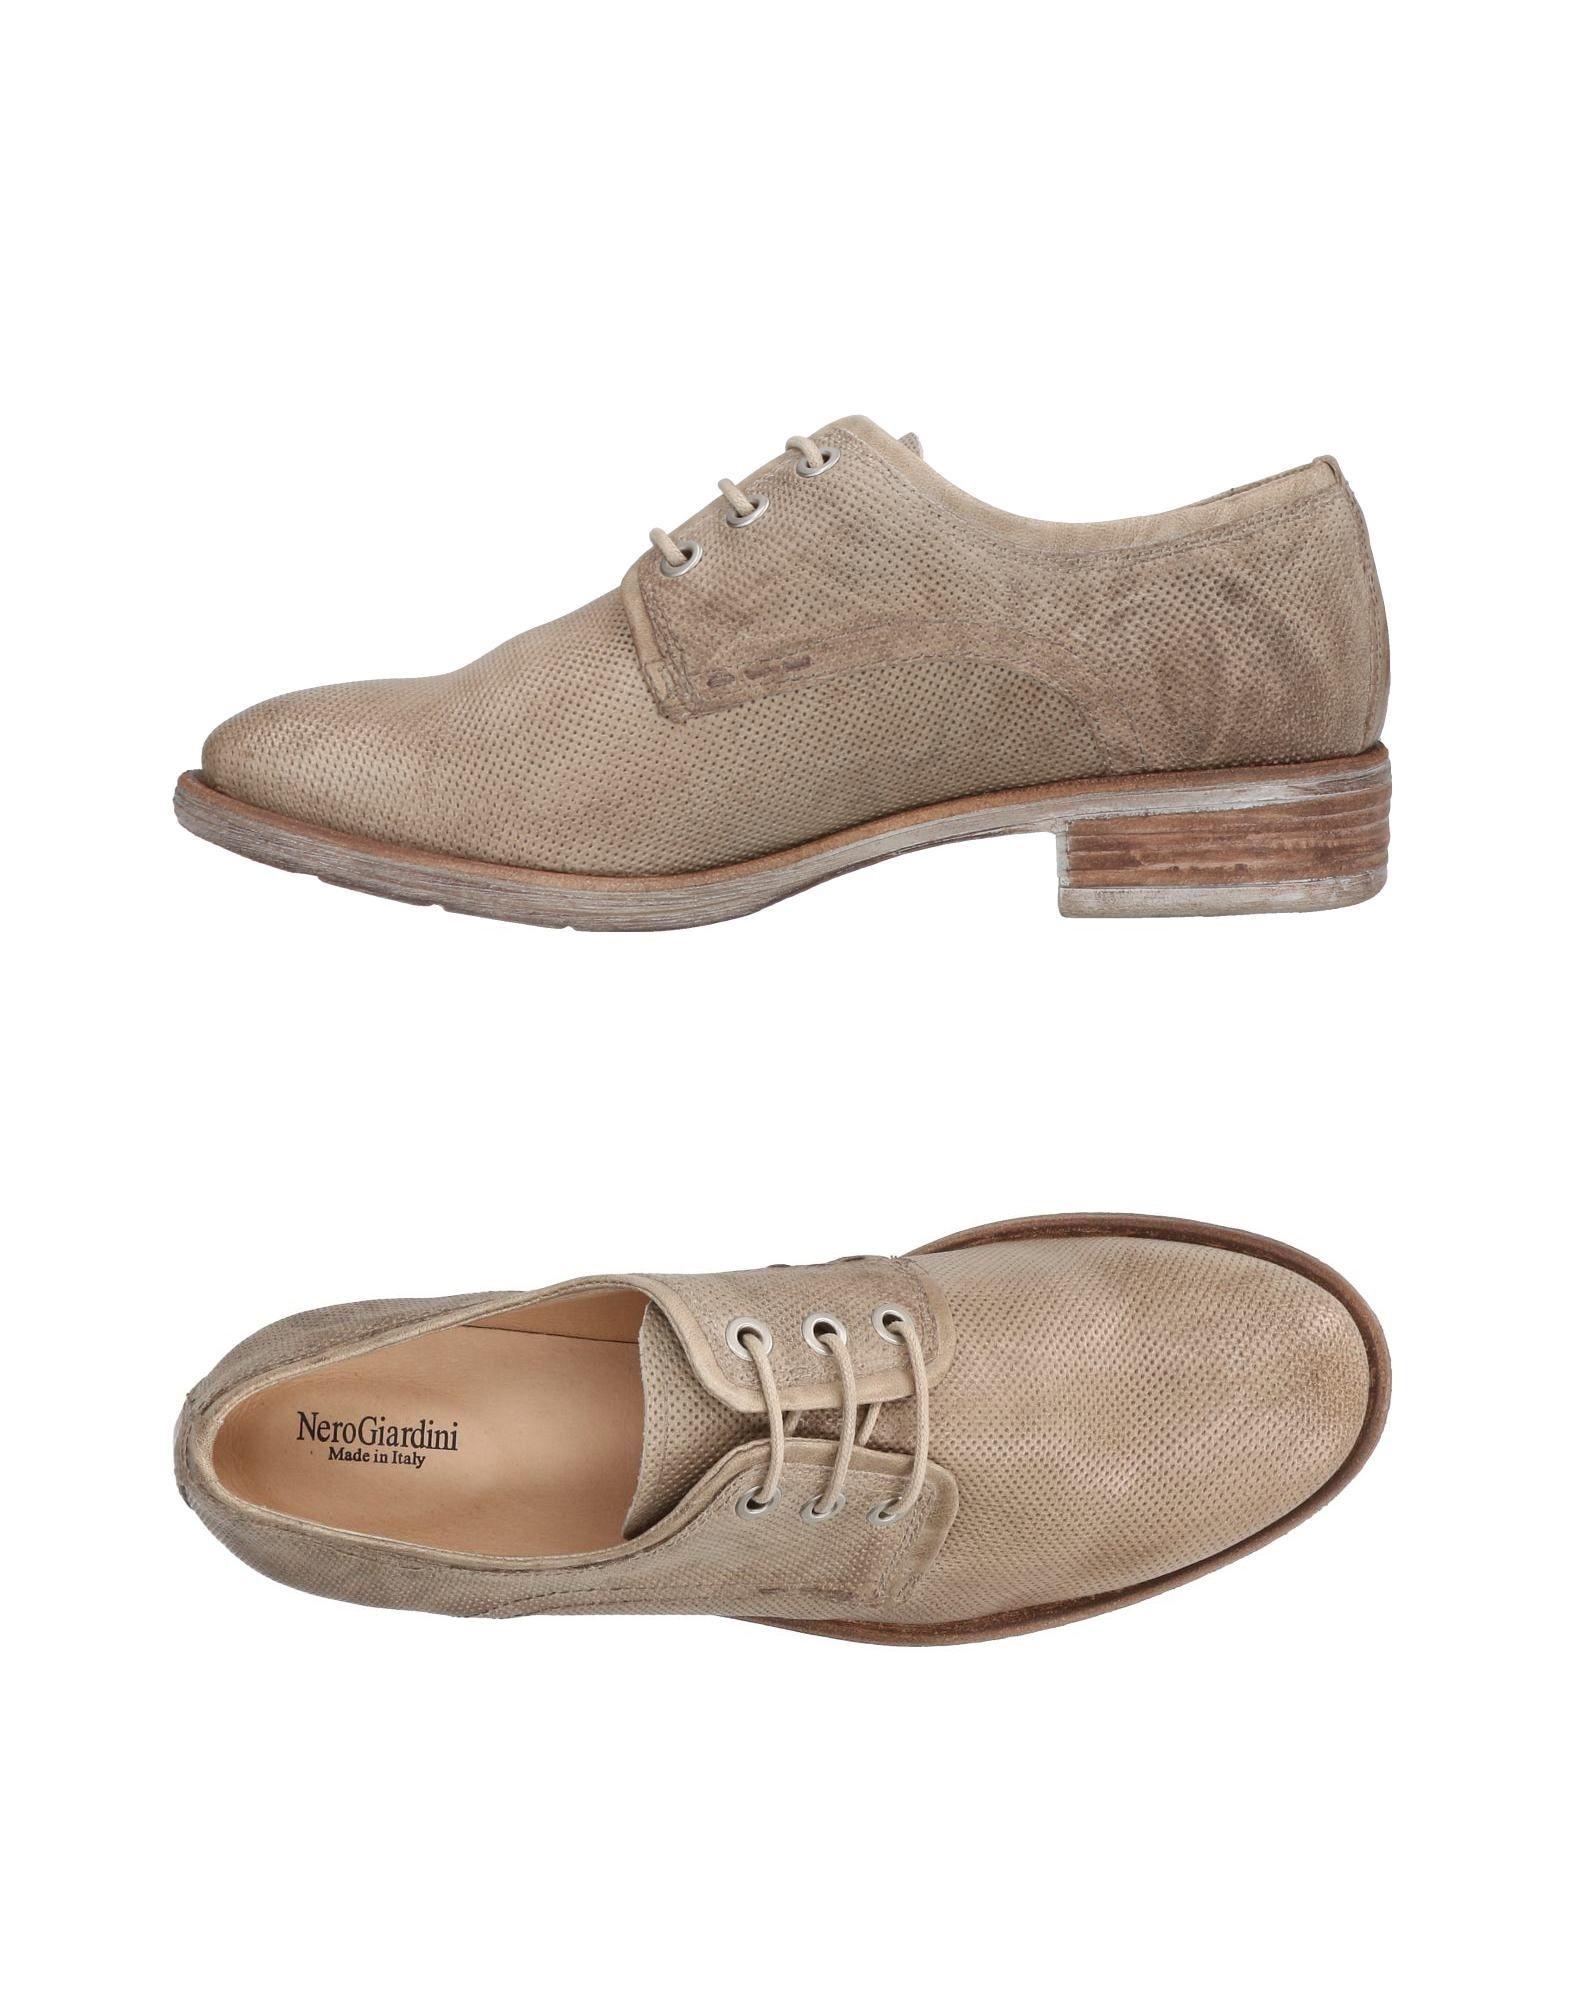 Chaussures À Lacets Nero Giardini Femme - Chaussures À Lacets Nero Giardini sur